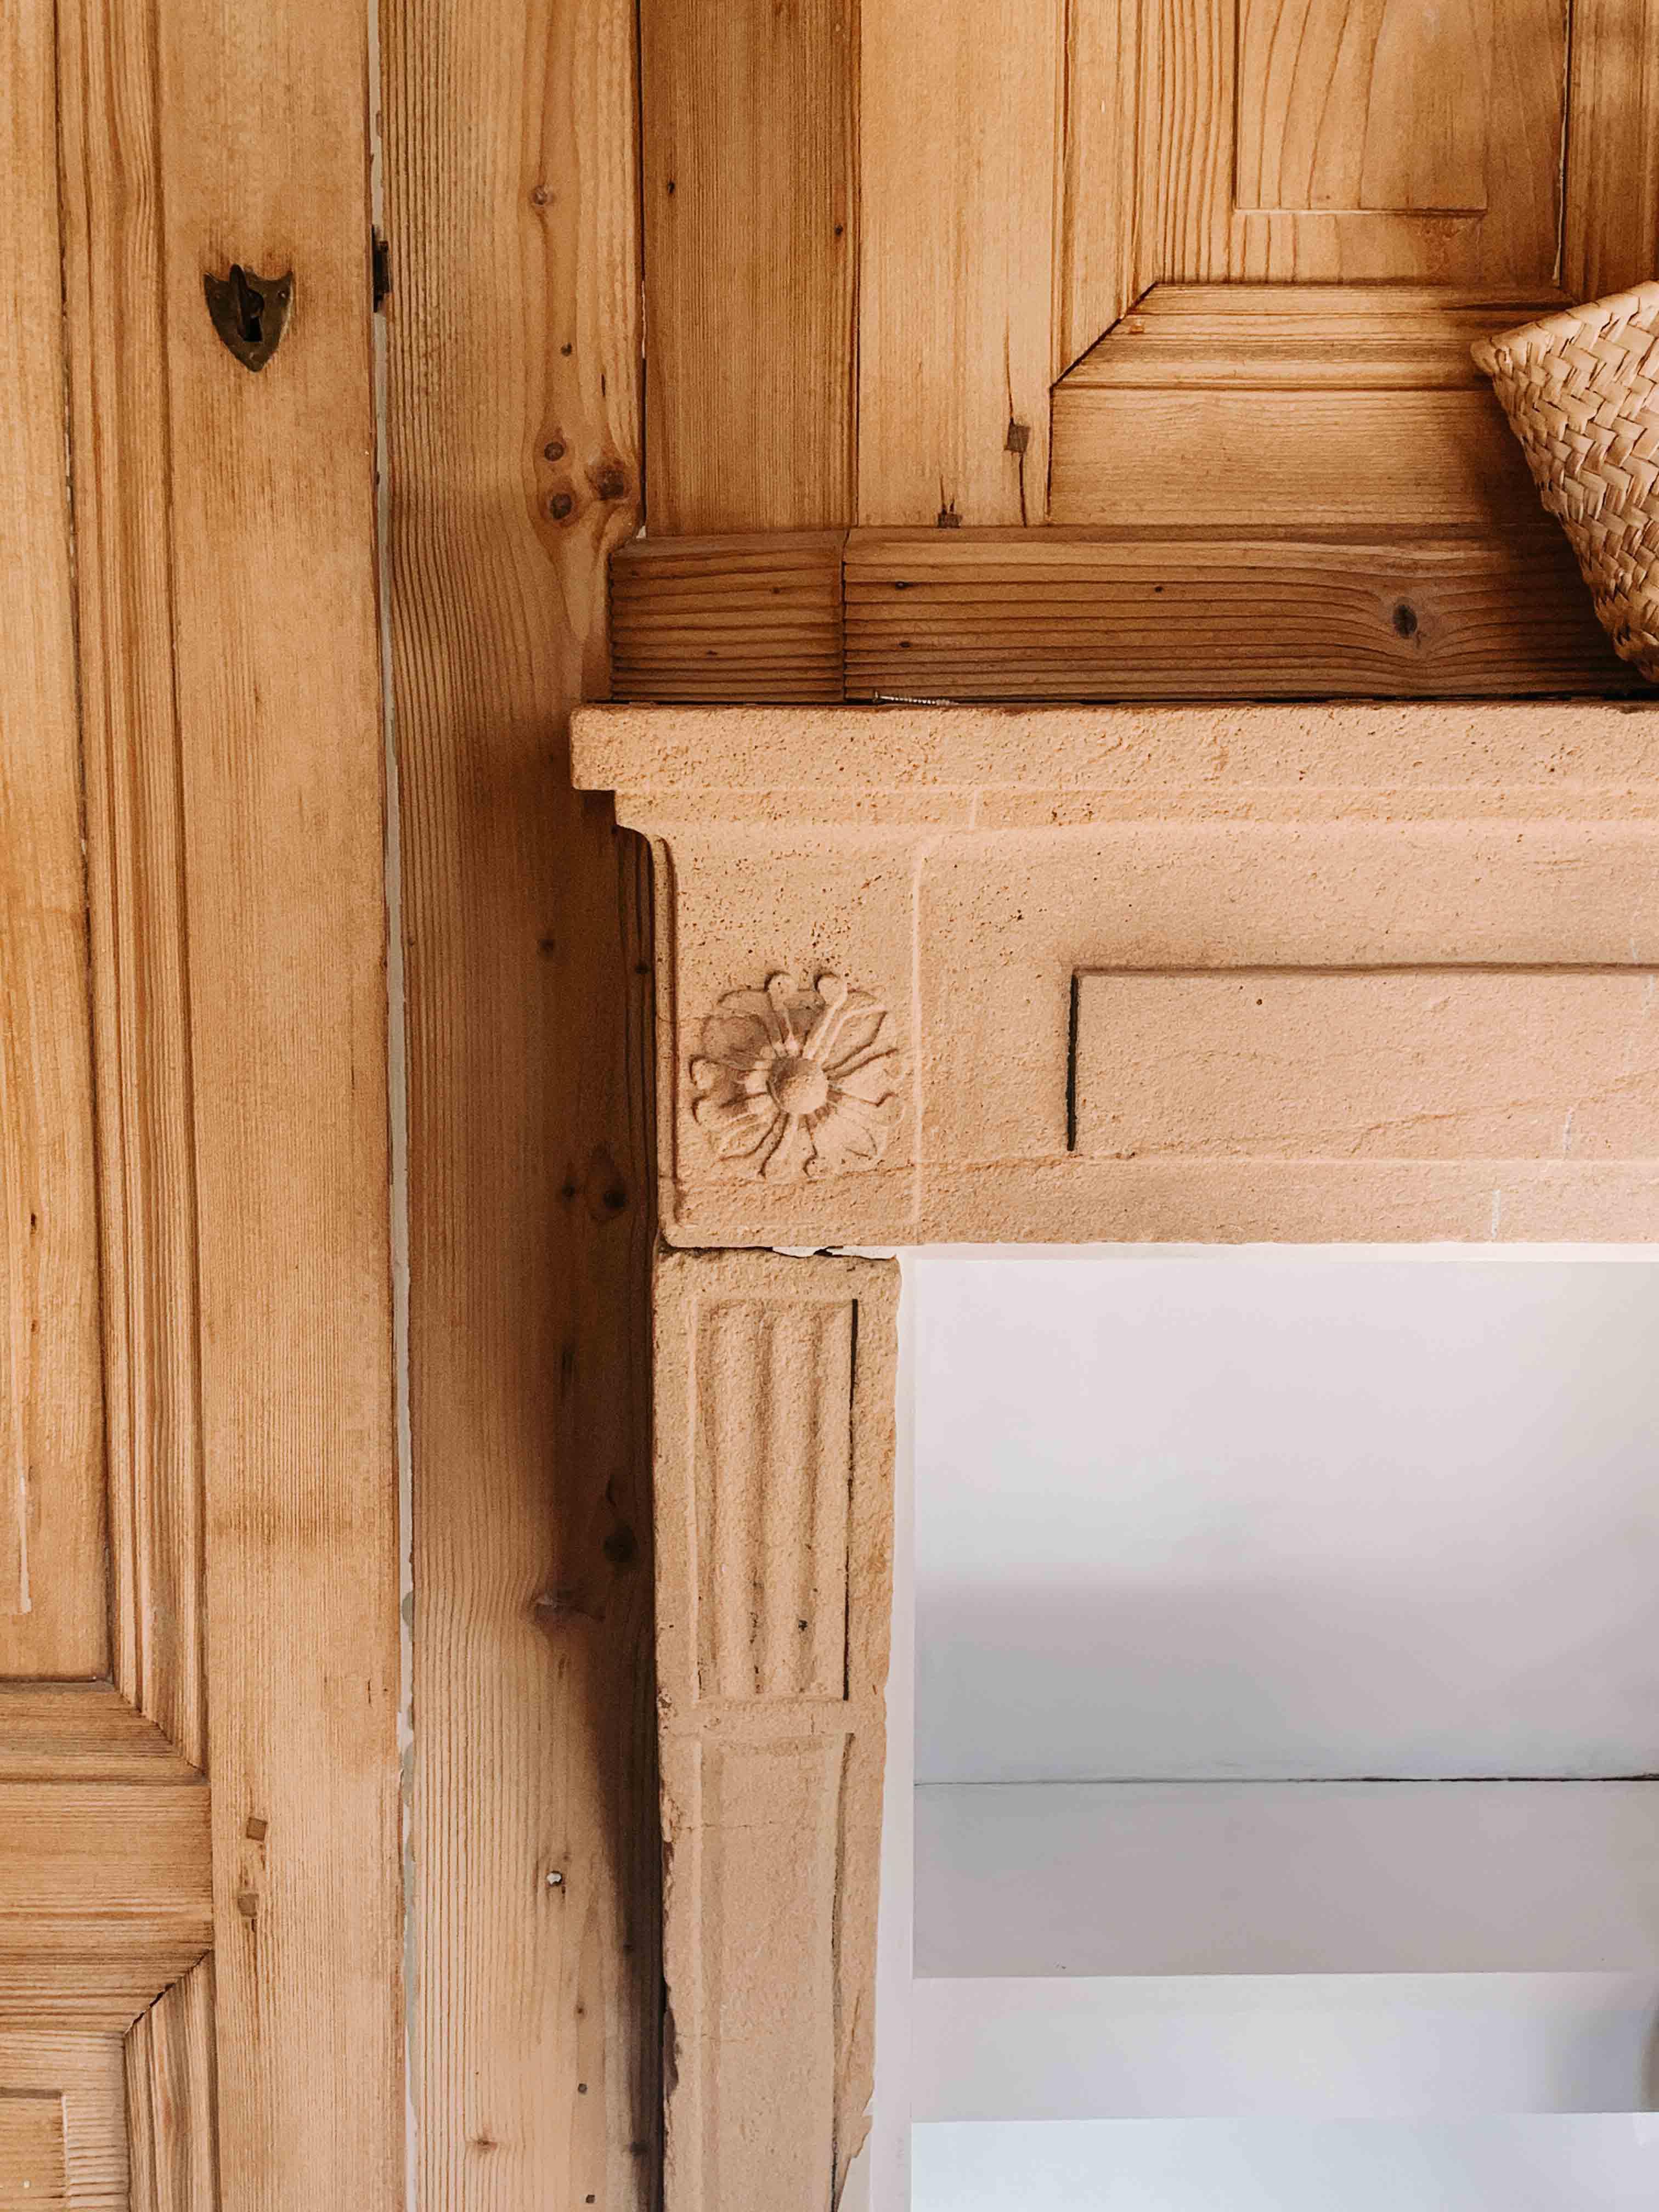 architecte-lyon-rénovation-presbytere-marcilly-azergues-pierre-dorée-3